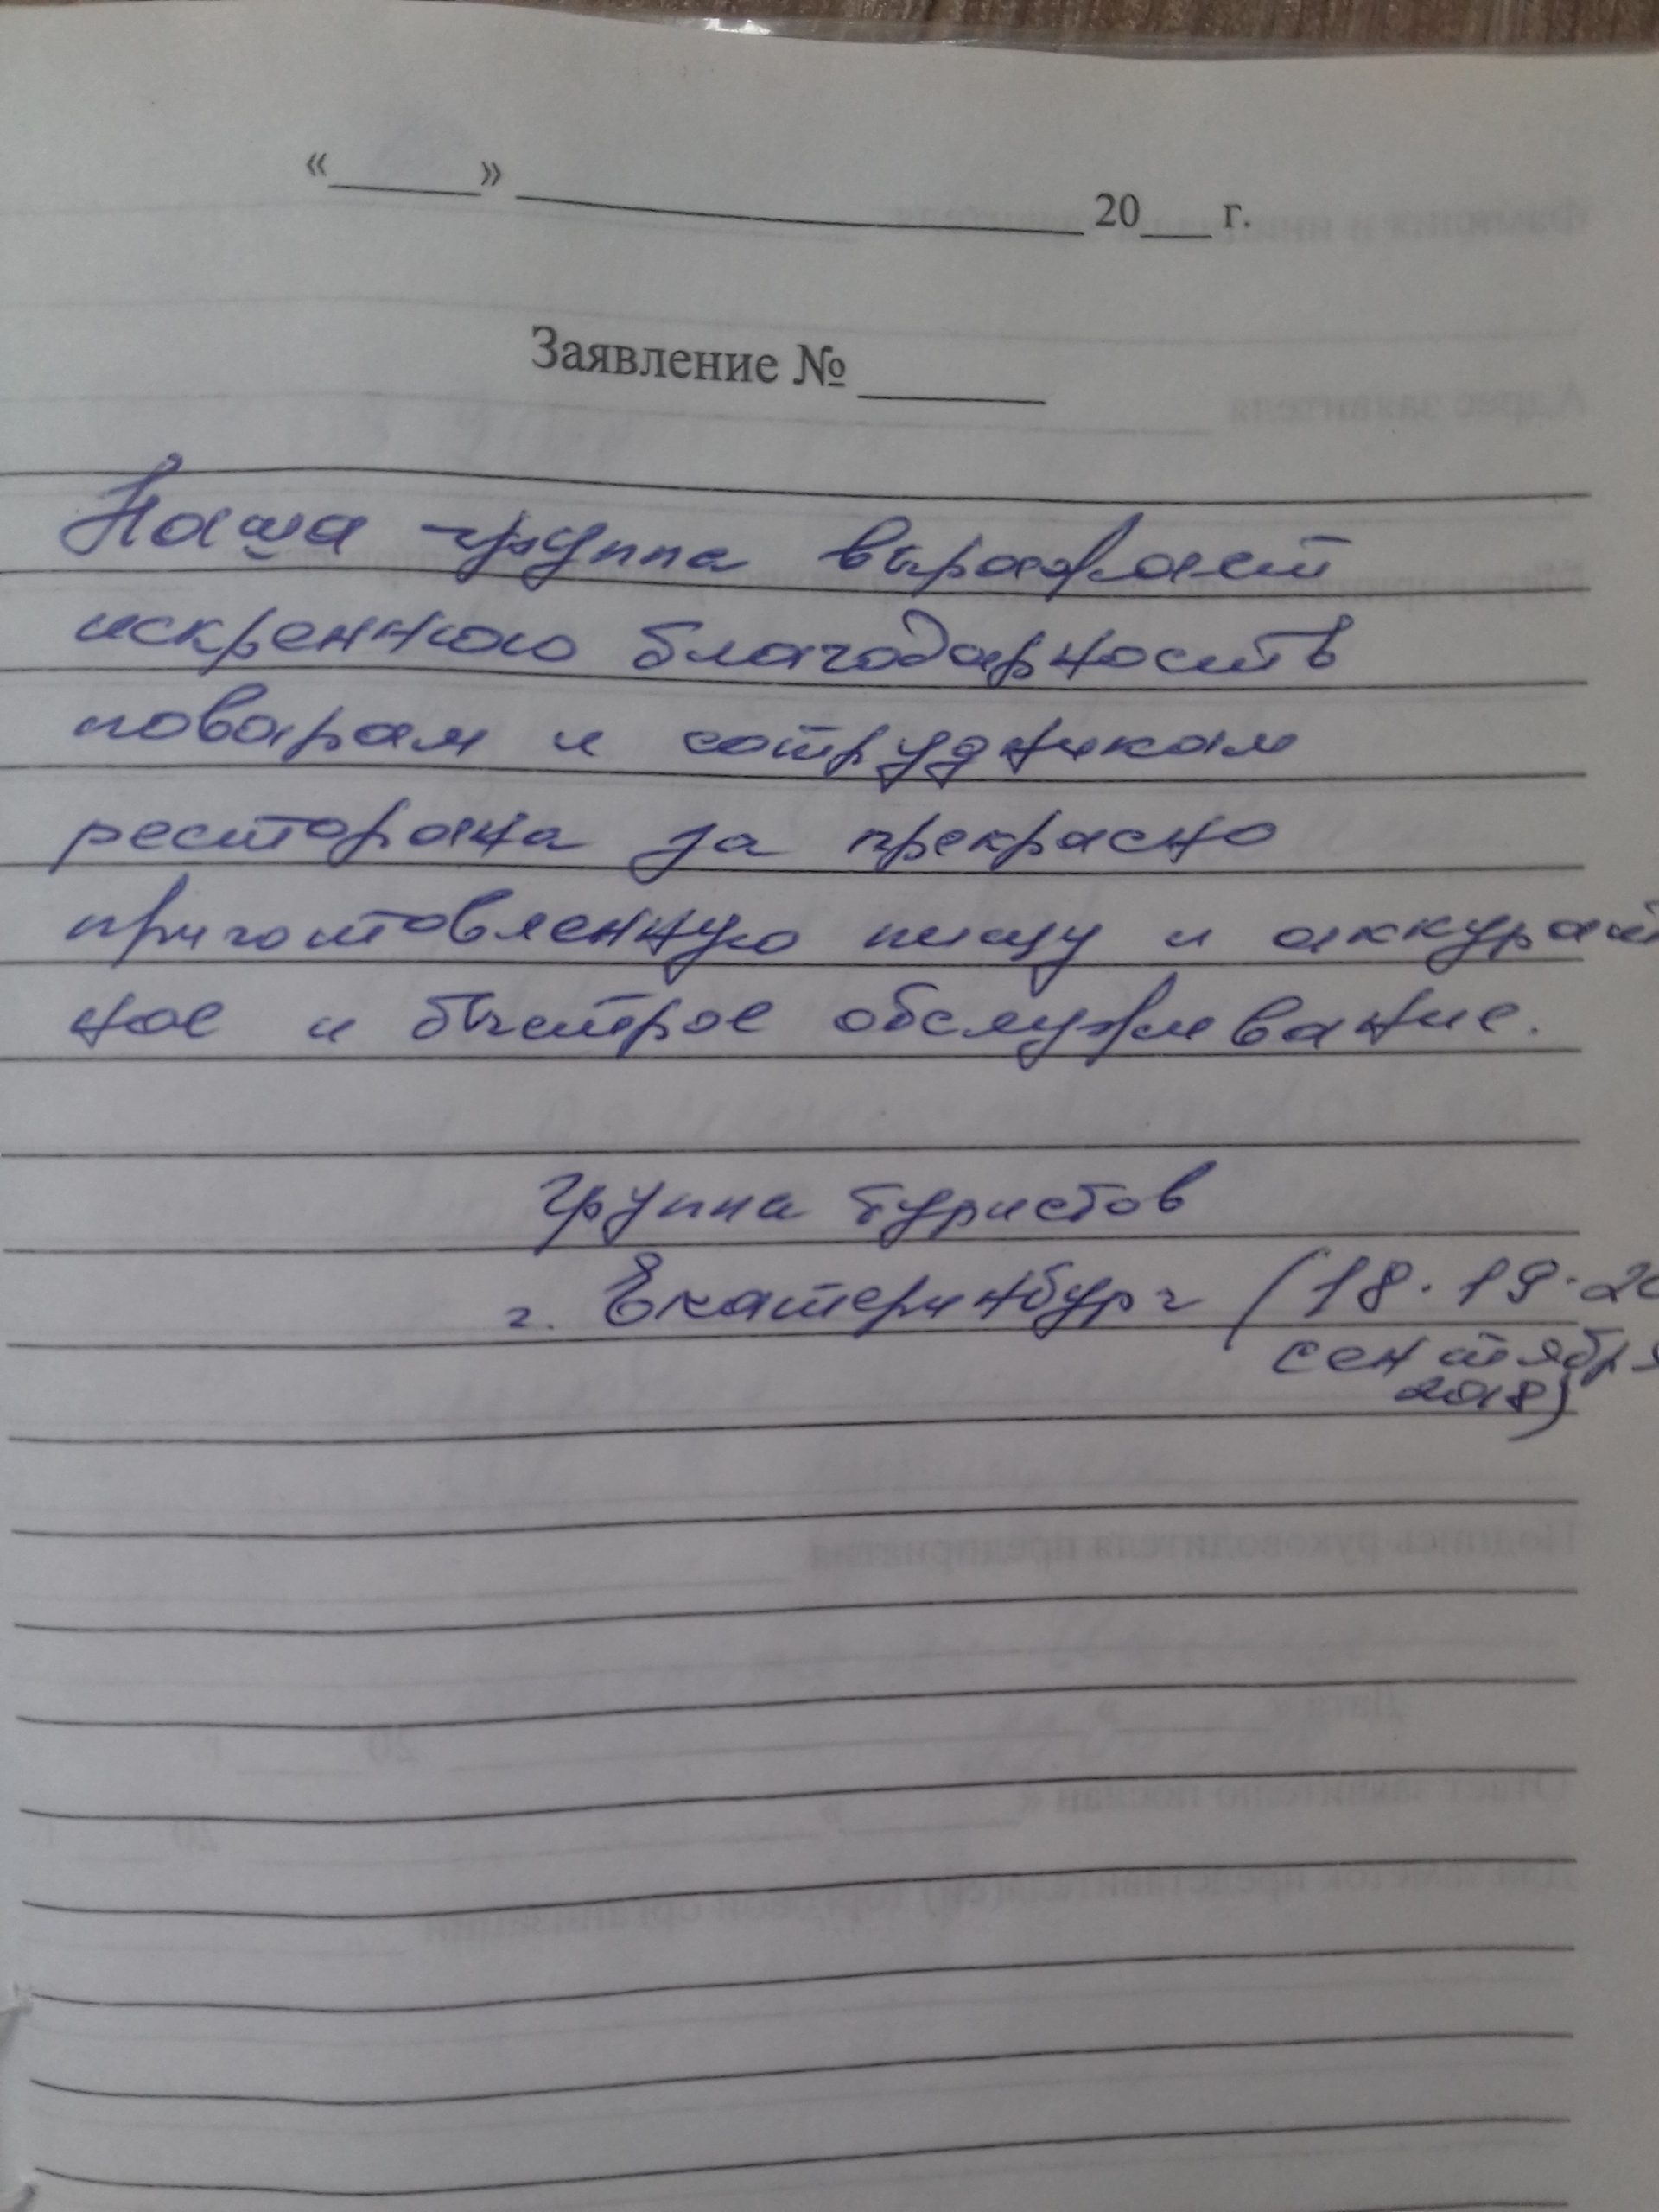 Группа туристов г.Екатеринбург.